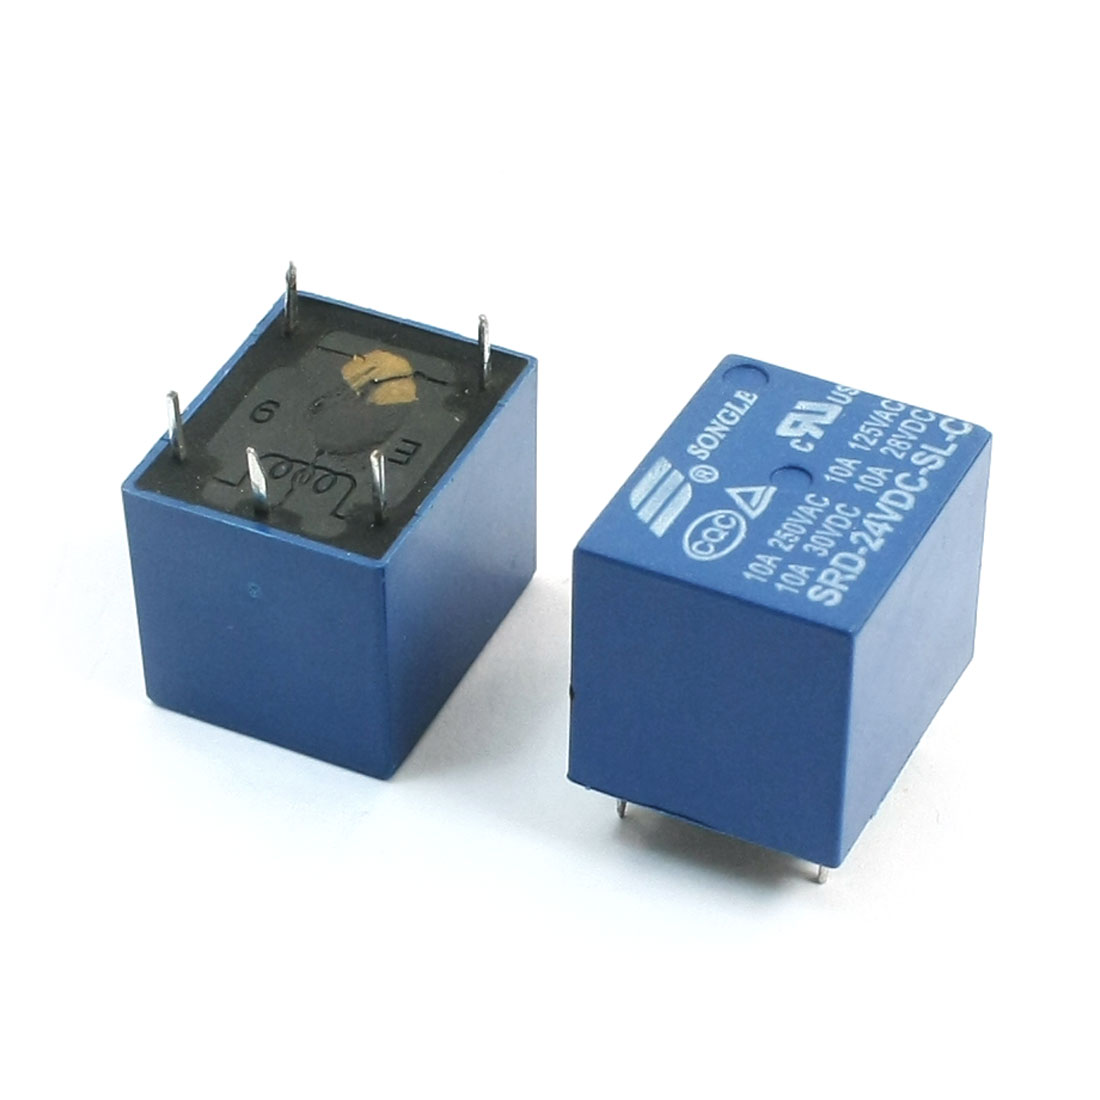 2 Pcs SRD-24VDC-SL-C DC 24V Coil Voltage SPDT 1NO 1NC 5 Pins Plug in Mount Blue Plastic General Purpose Power Relay